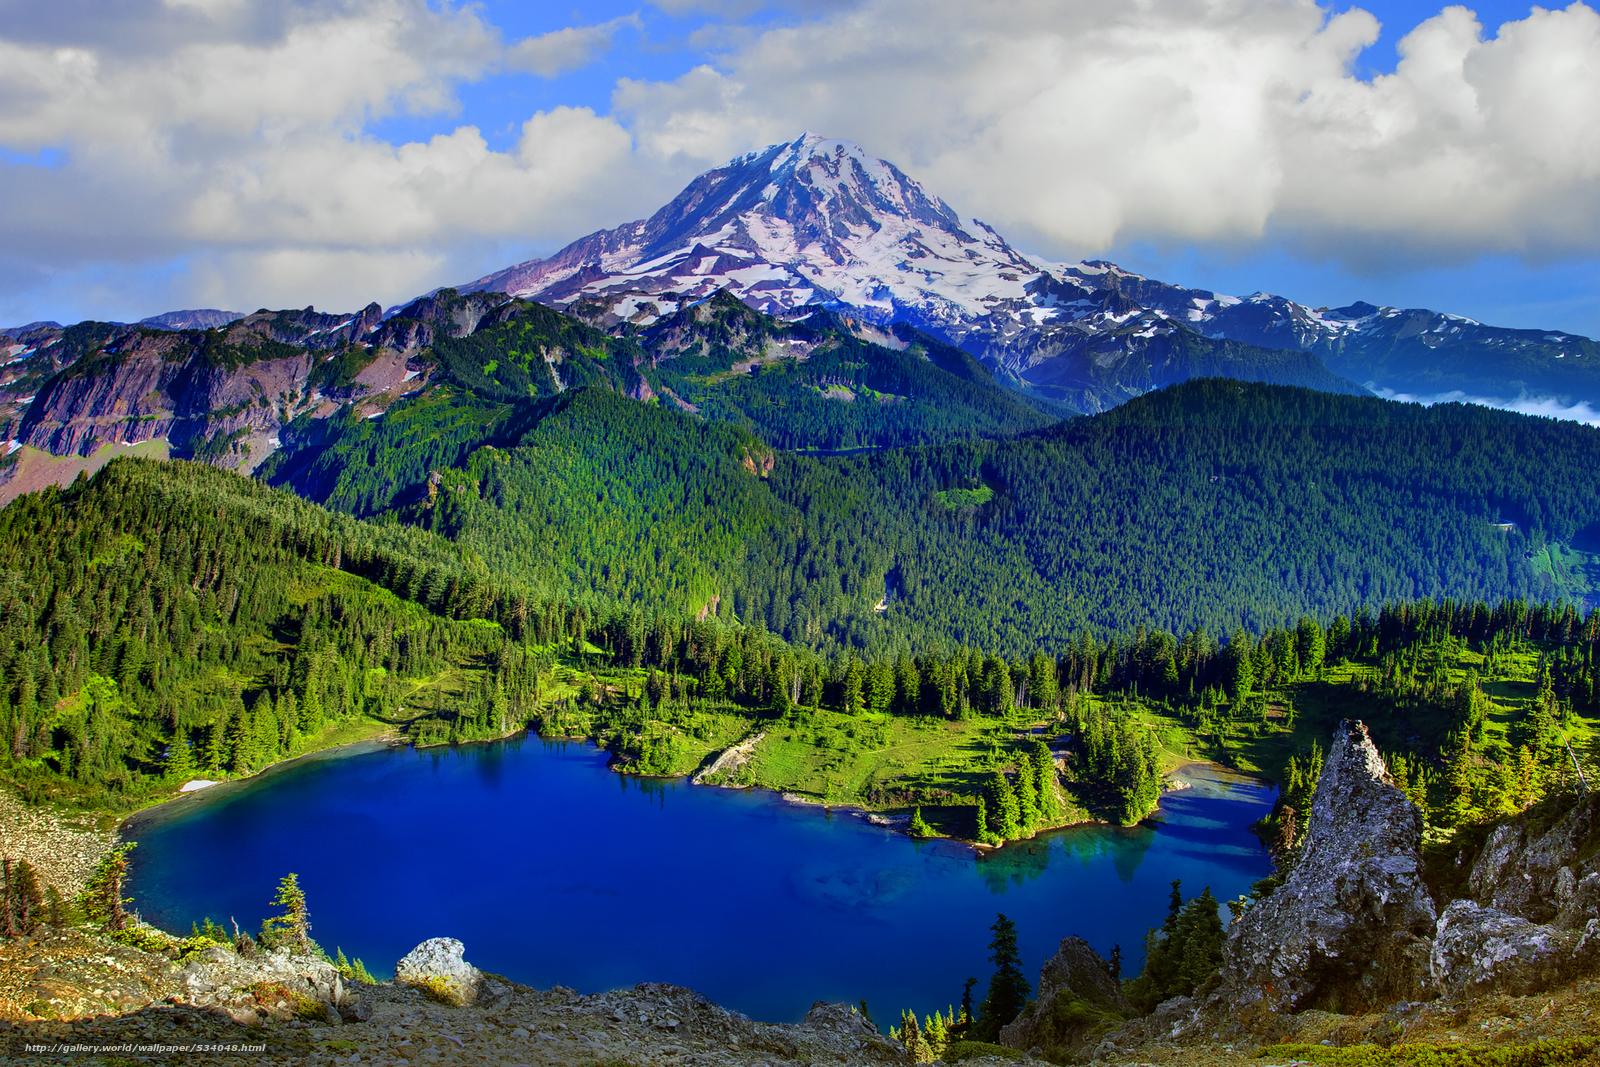 Download wallpaper tolmie peak mount rainier national park 1600x1067